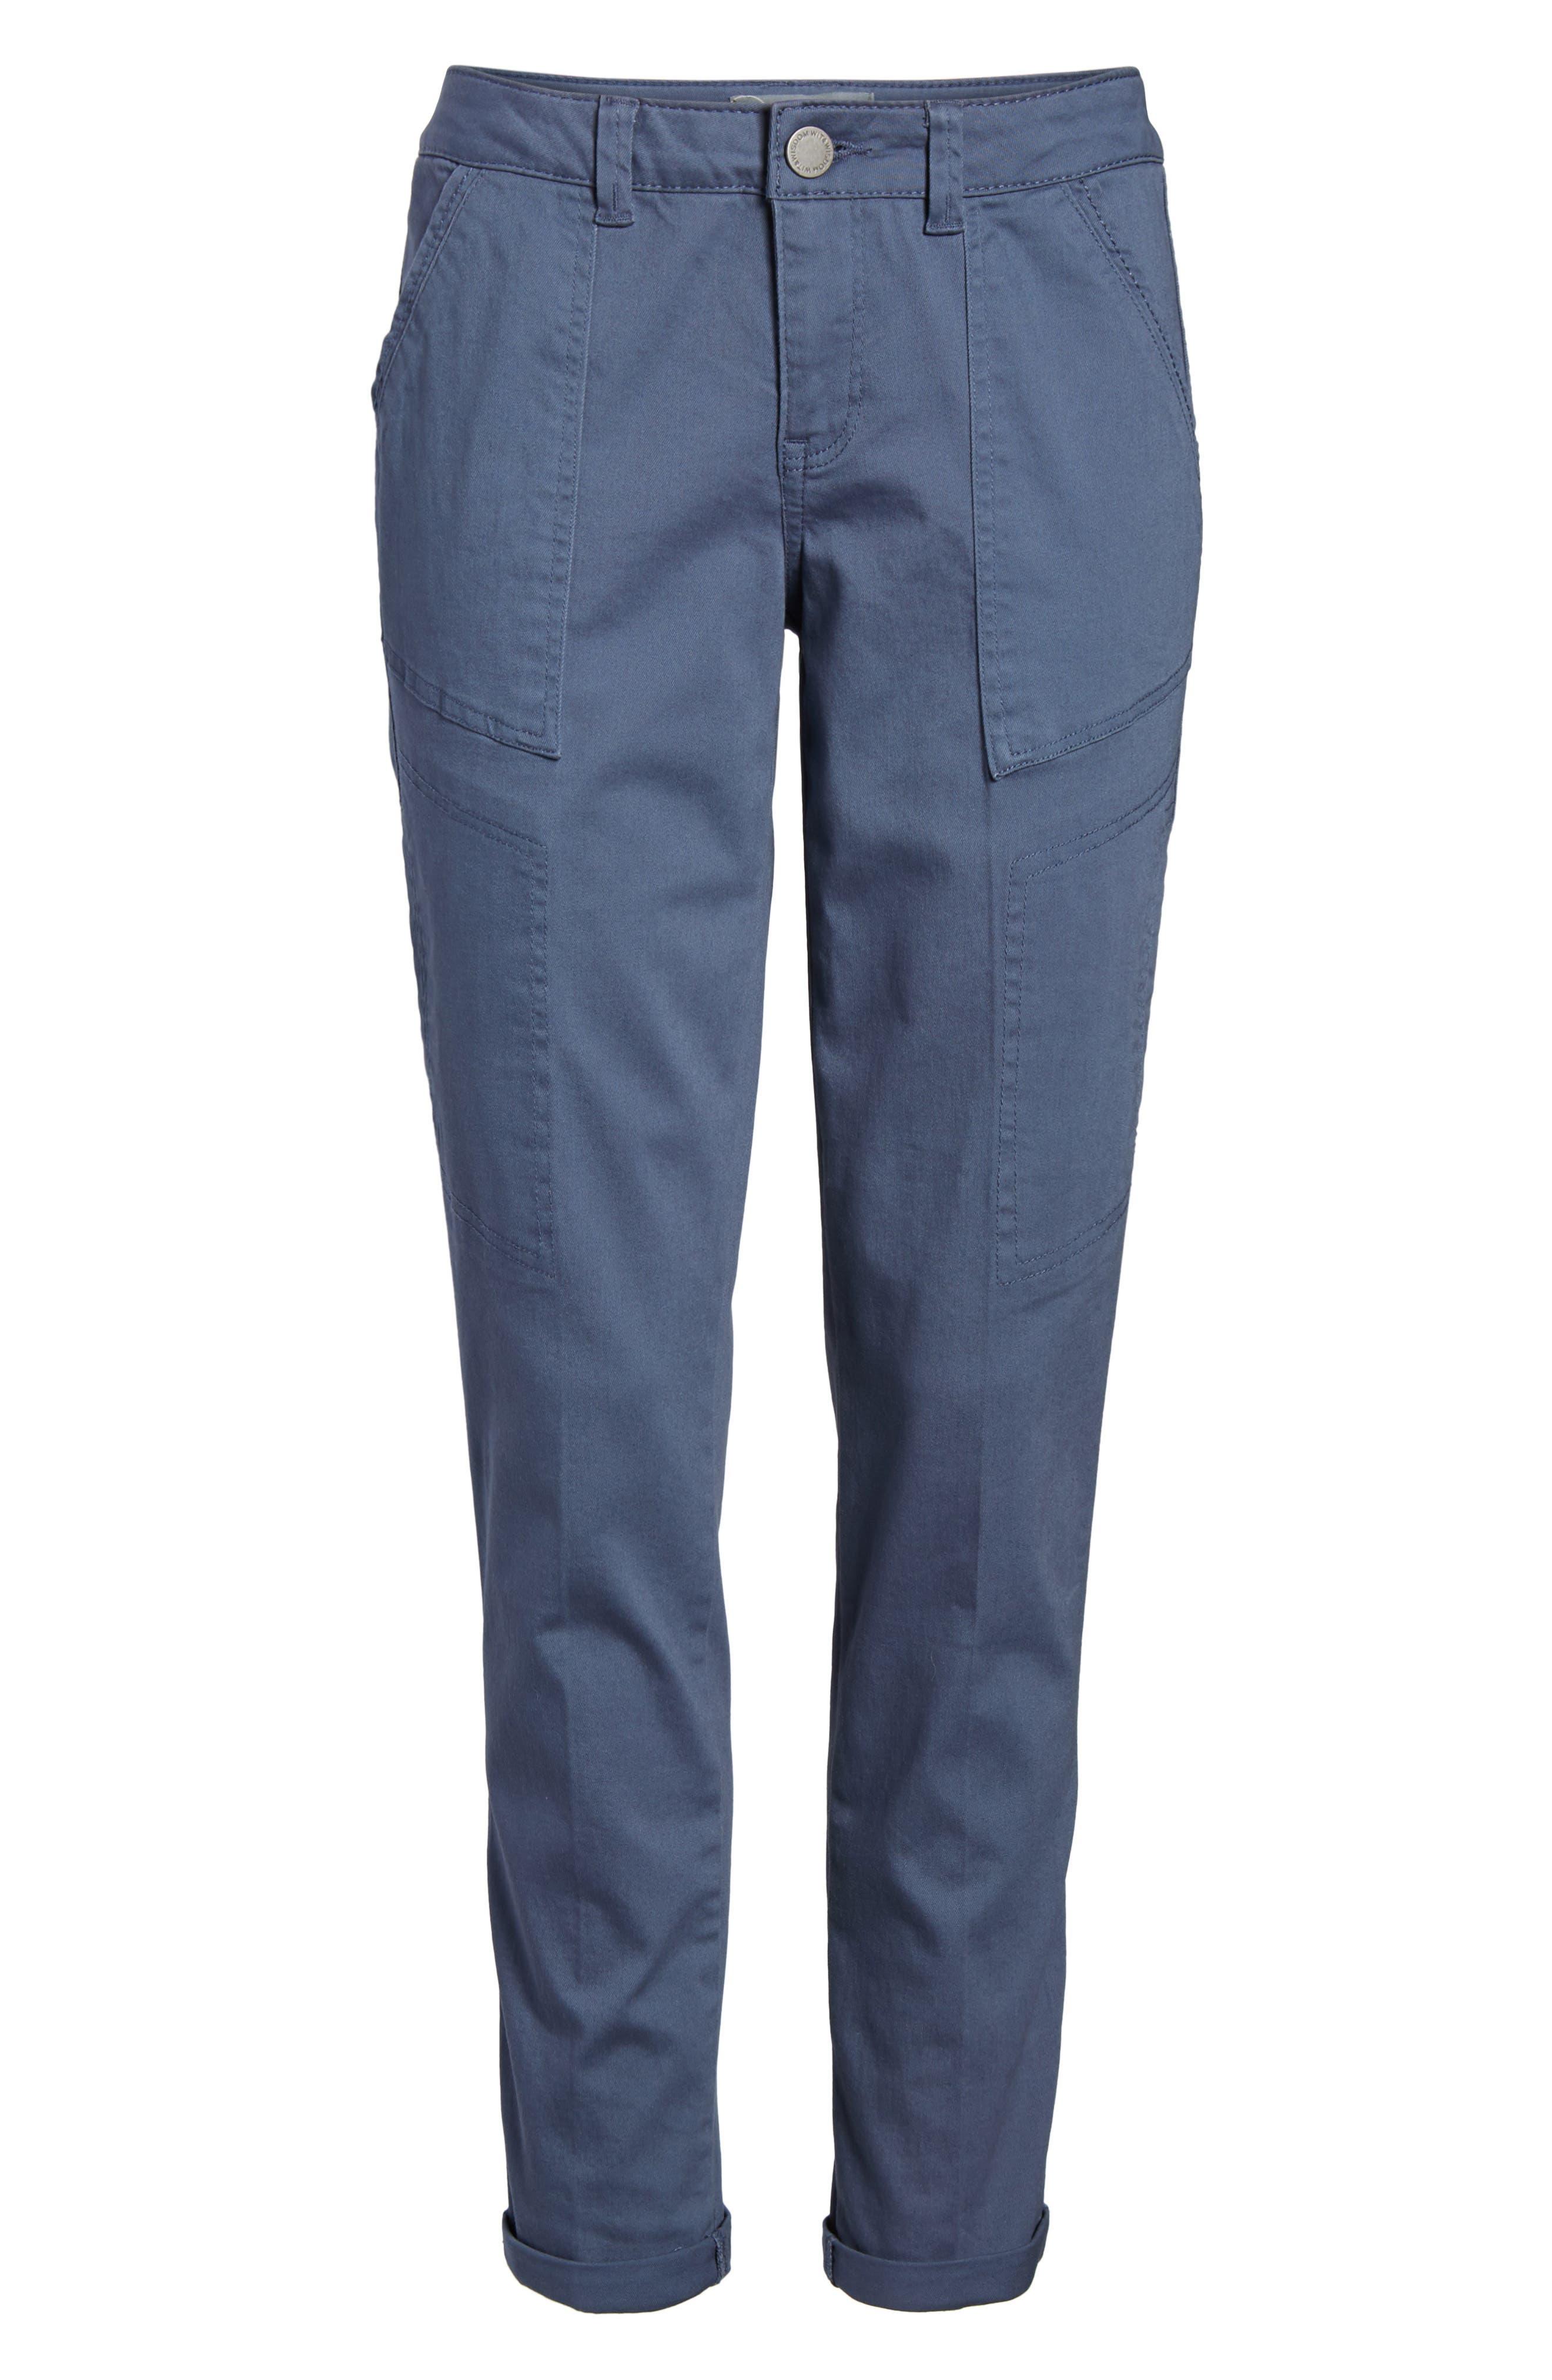 Twill Cargo Pants,                             Alternate thumbnail 7, color,                             Slate Blue